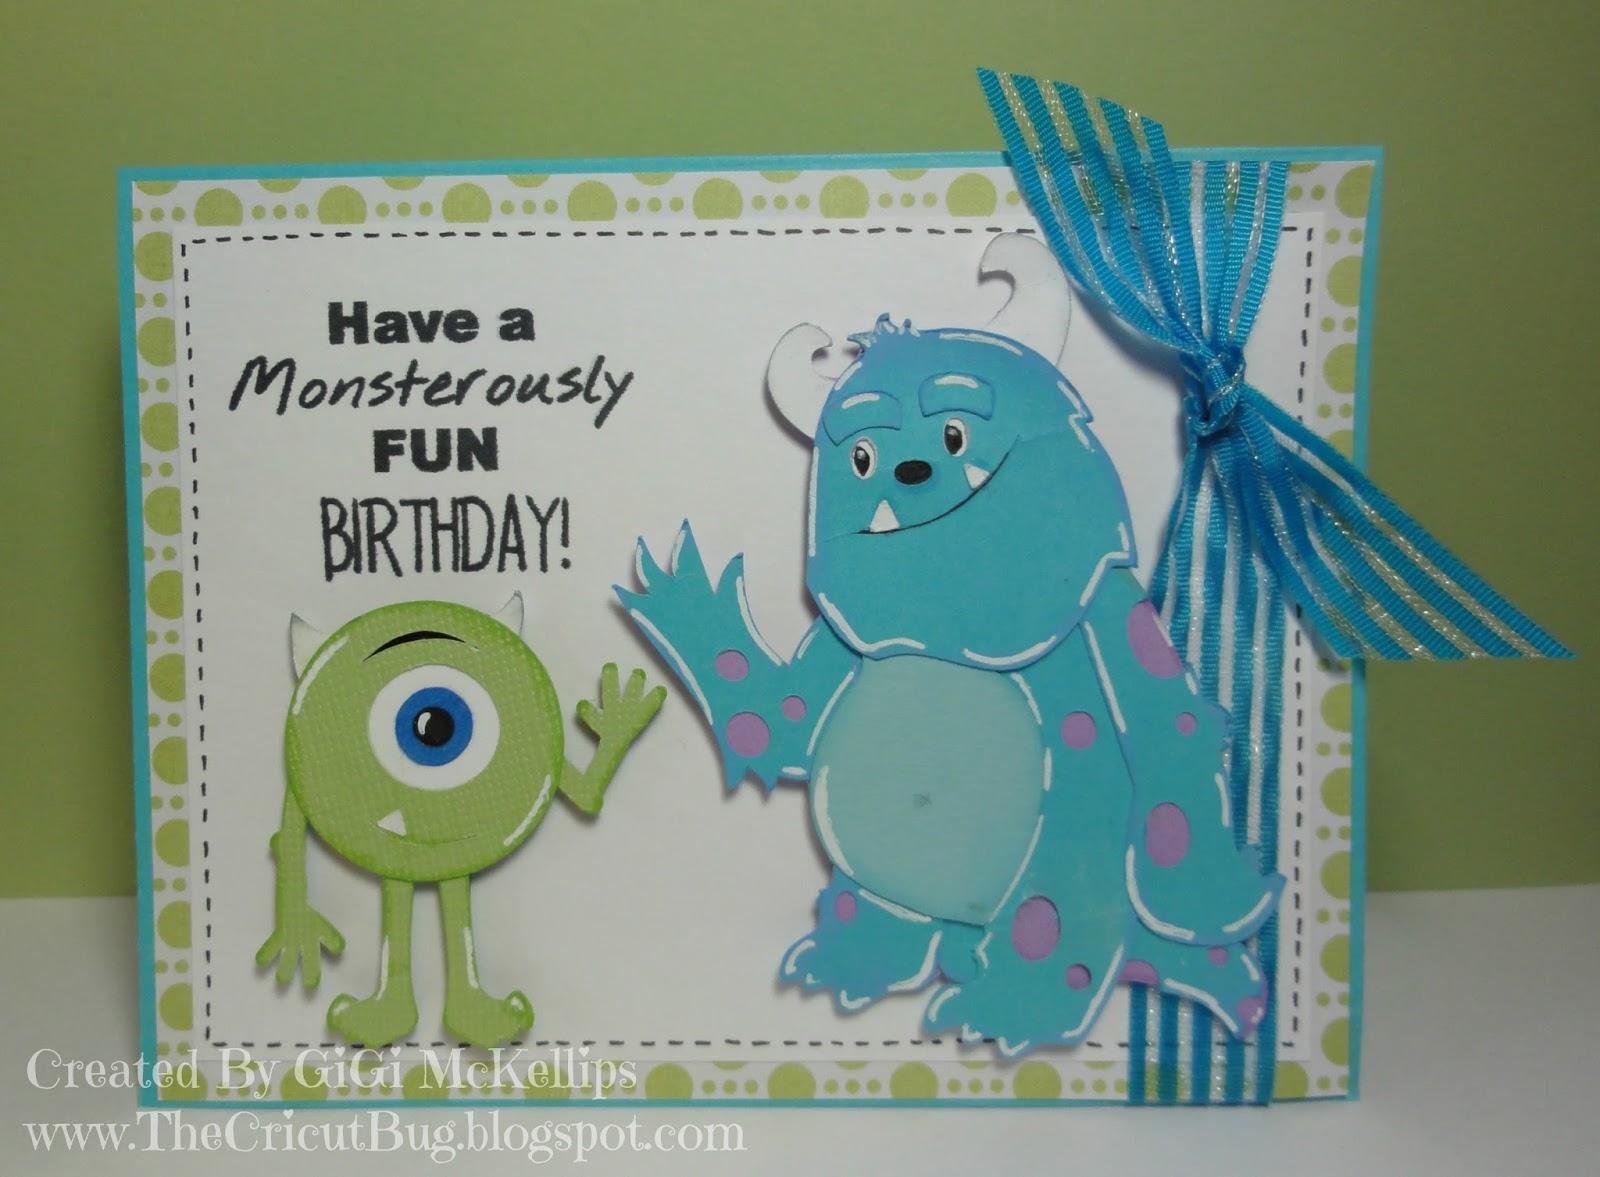 The Cricut Bug Monsters Inc Birthday